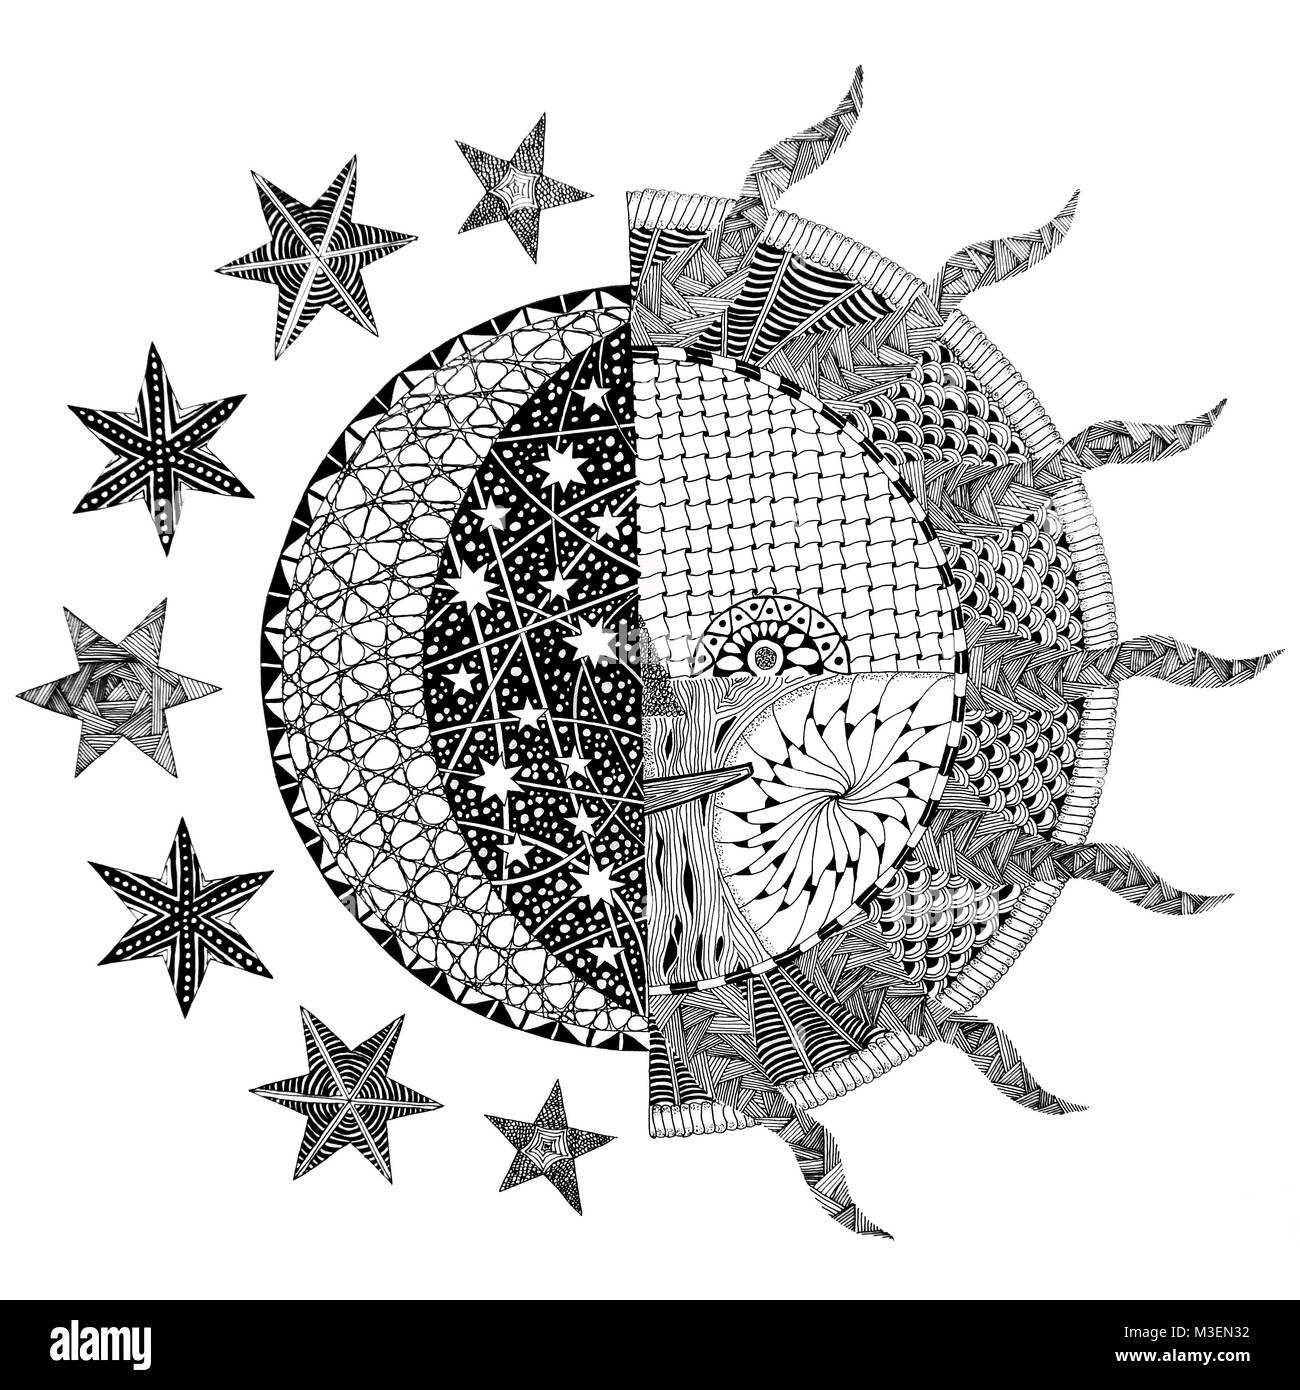 Moon and Sun Zentangle / Doodle Design - Stock Image